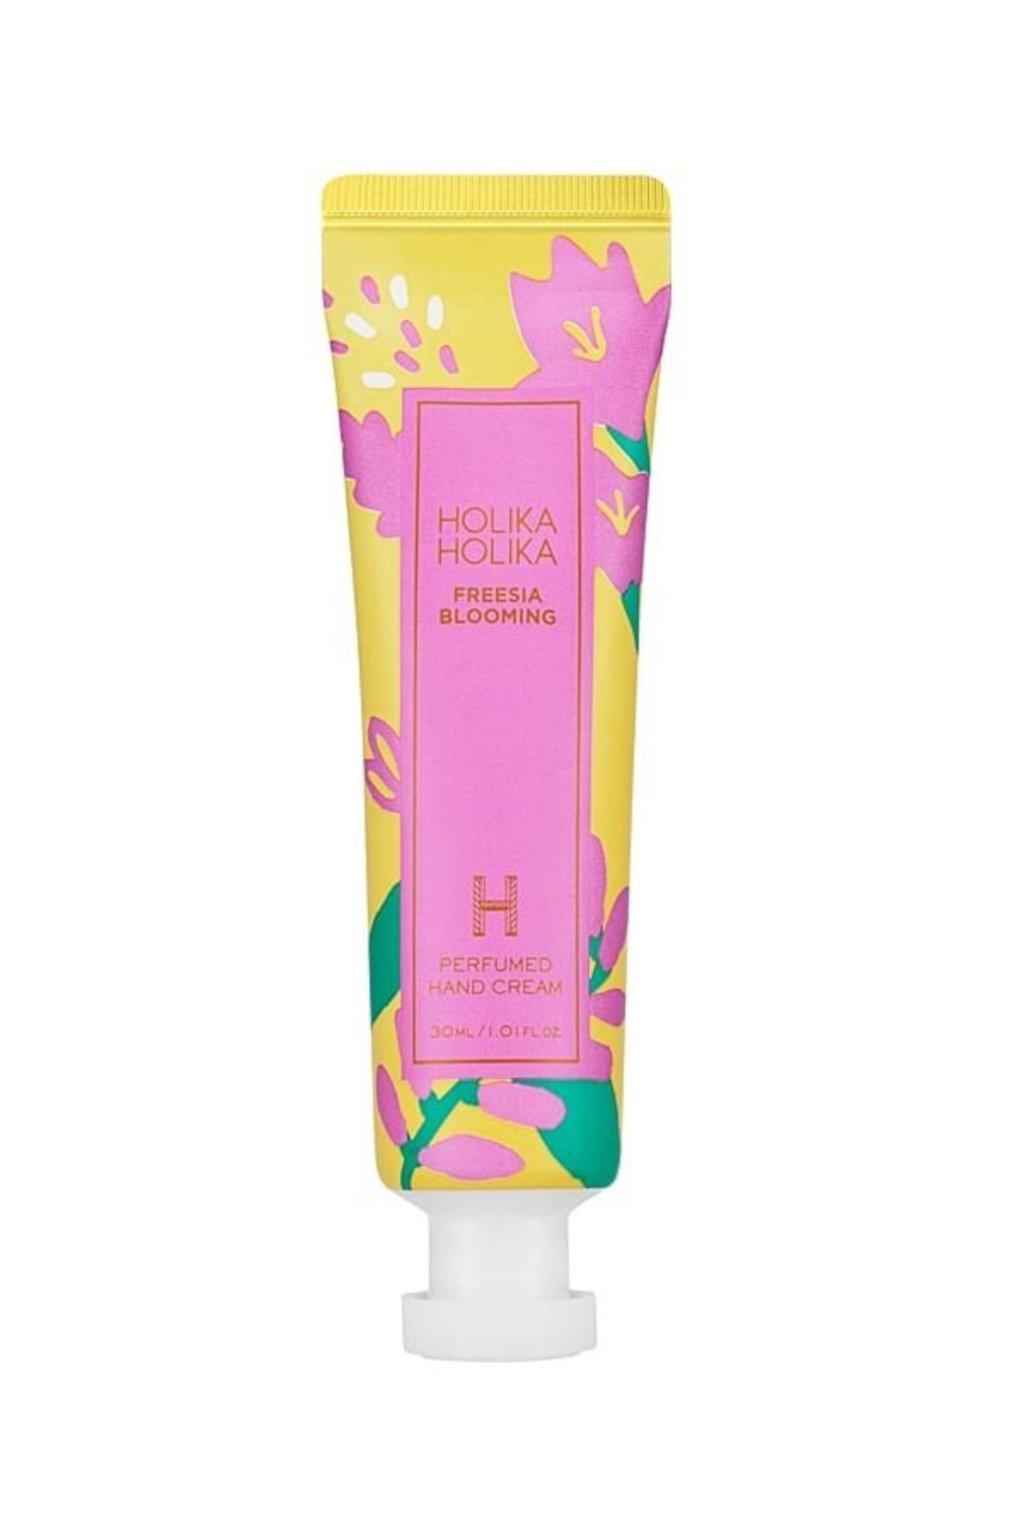 Holika Holika Freesia Blooming Perfumed Hand Cream